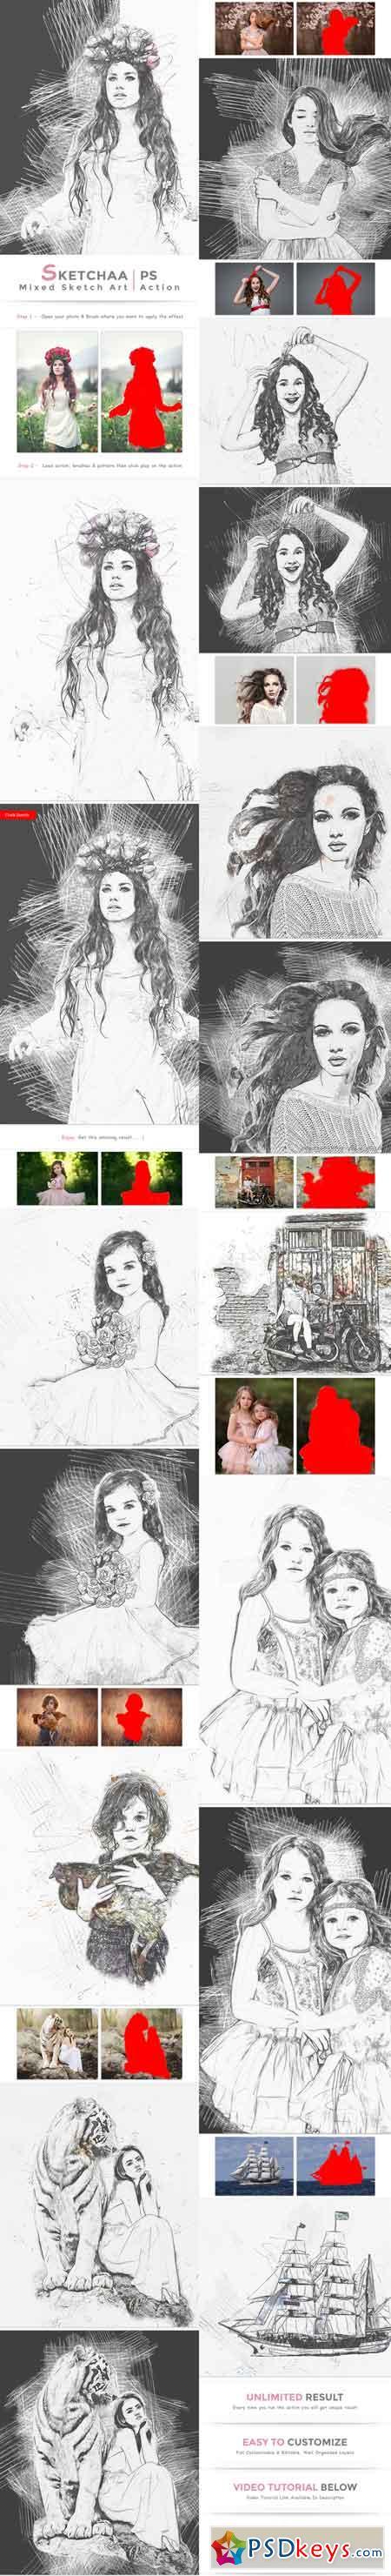 Sketchaa - Mixed Sketch Art 22863055